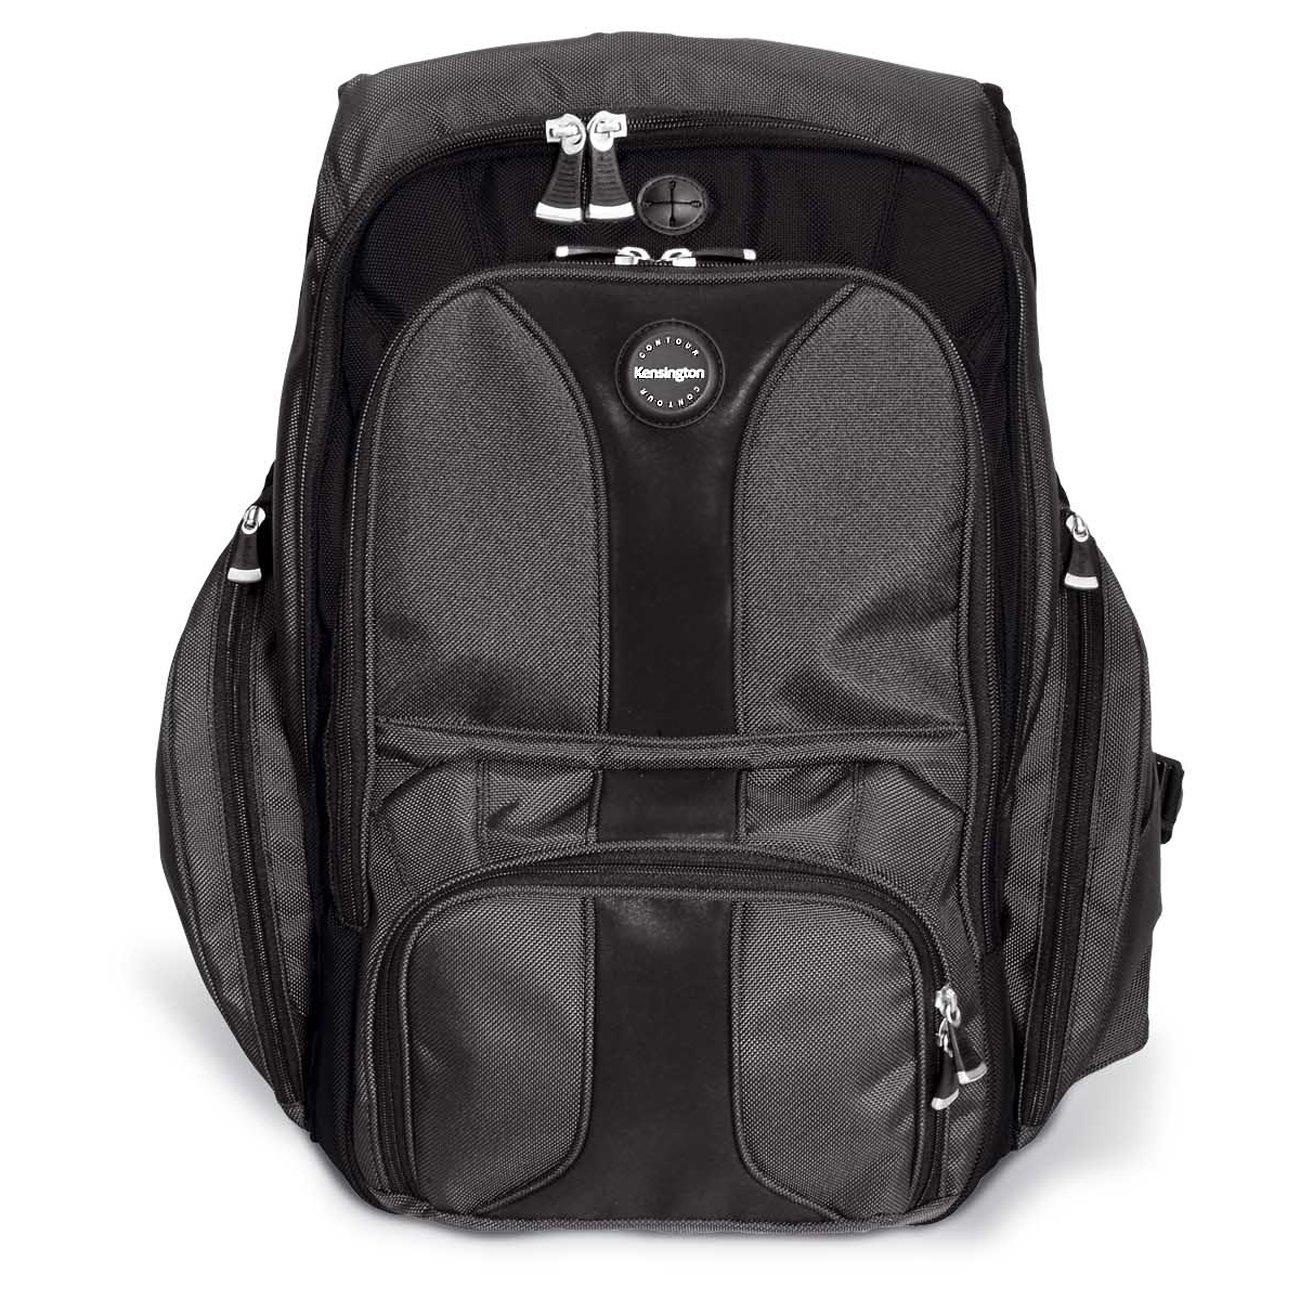 "Kensington Contour Carrying Case (Backpack) for 40.6 cm (16"") Notebook - Black"